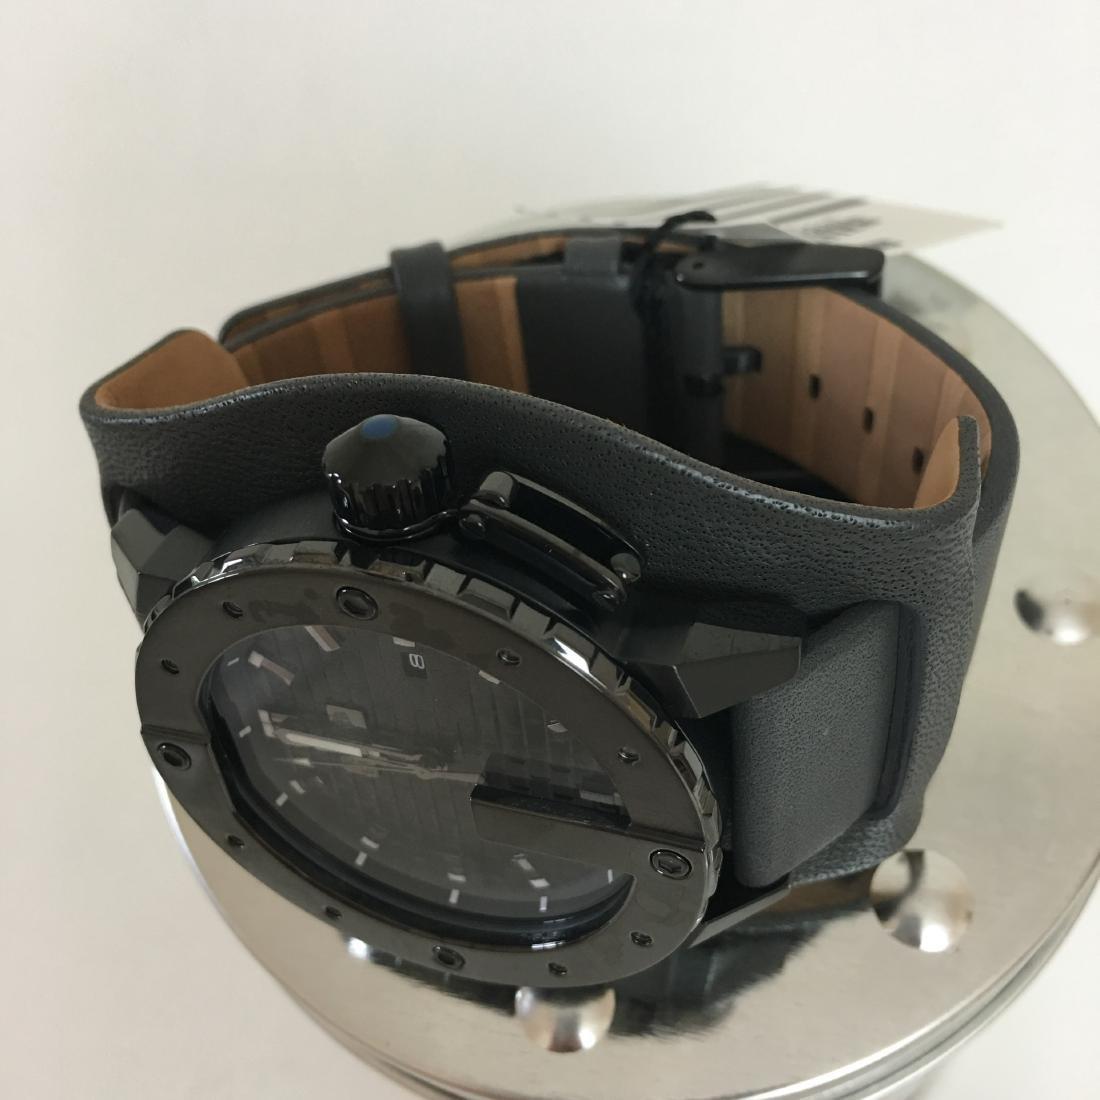 Jean Paul Gaultier – Men's Designer Wrist Watch - 8